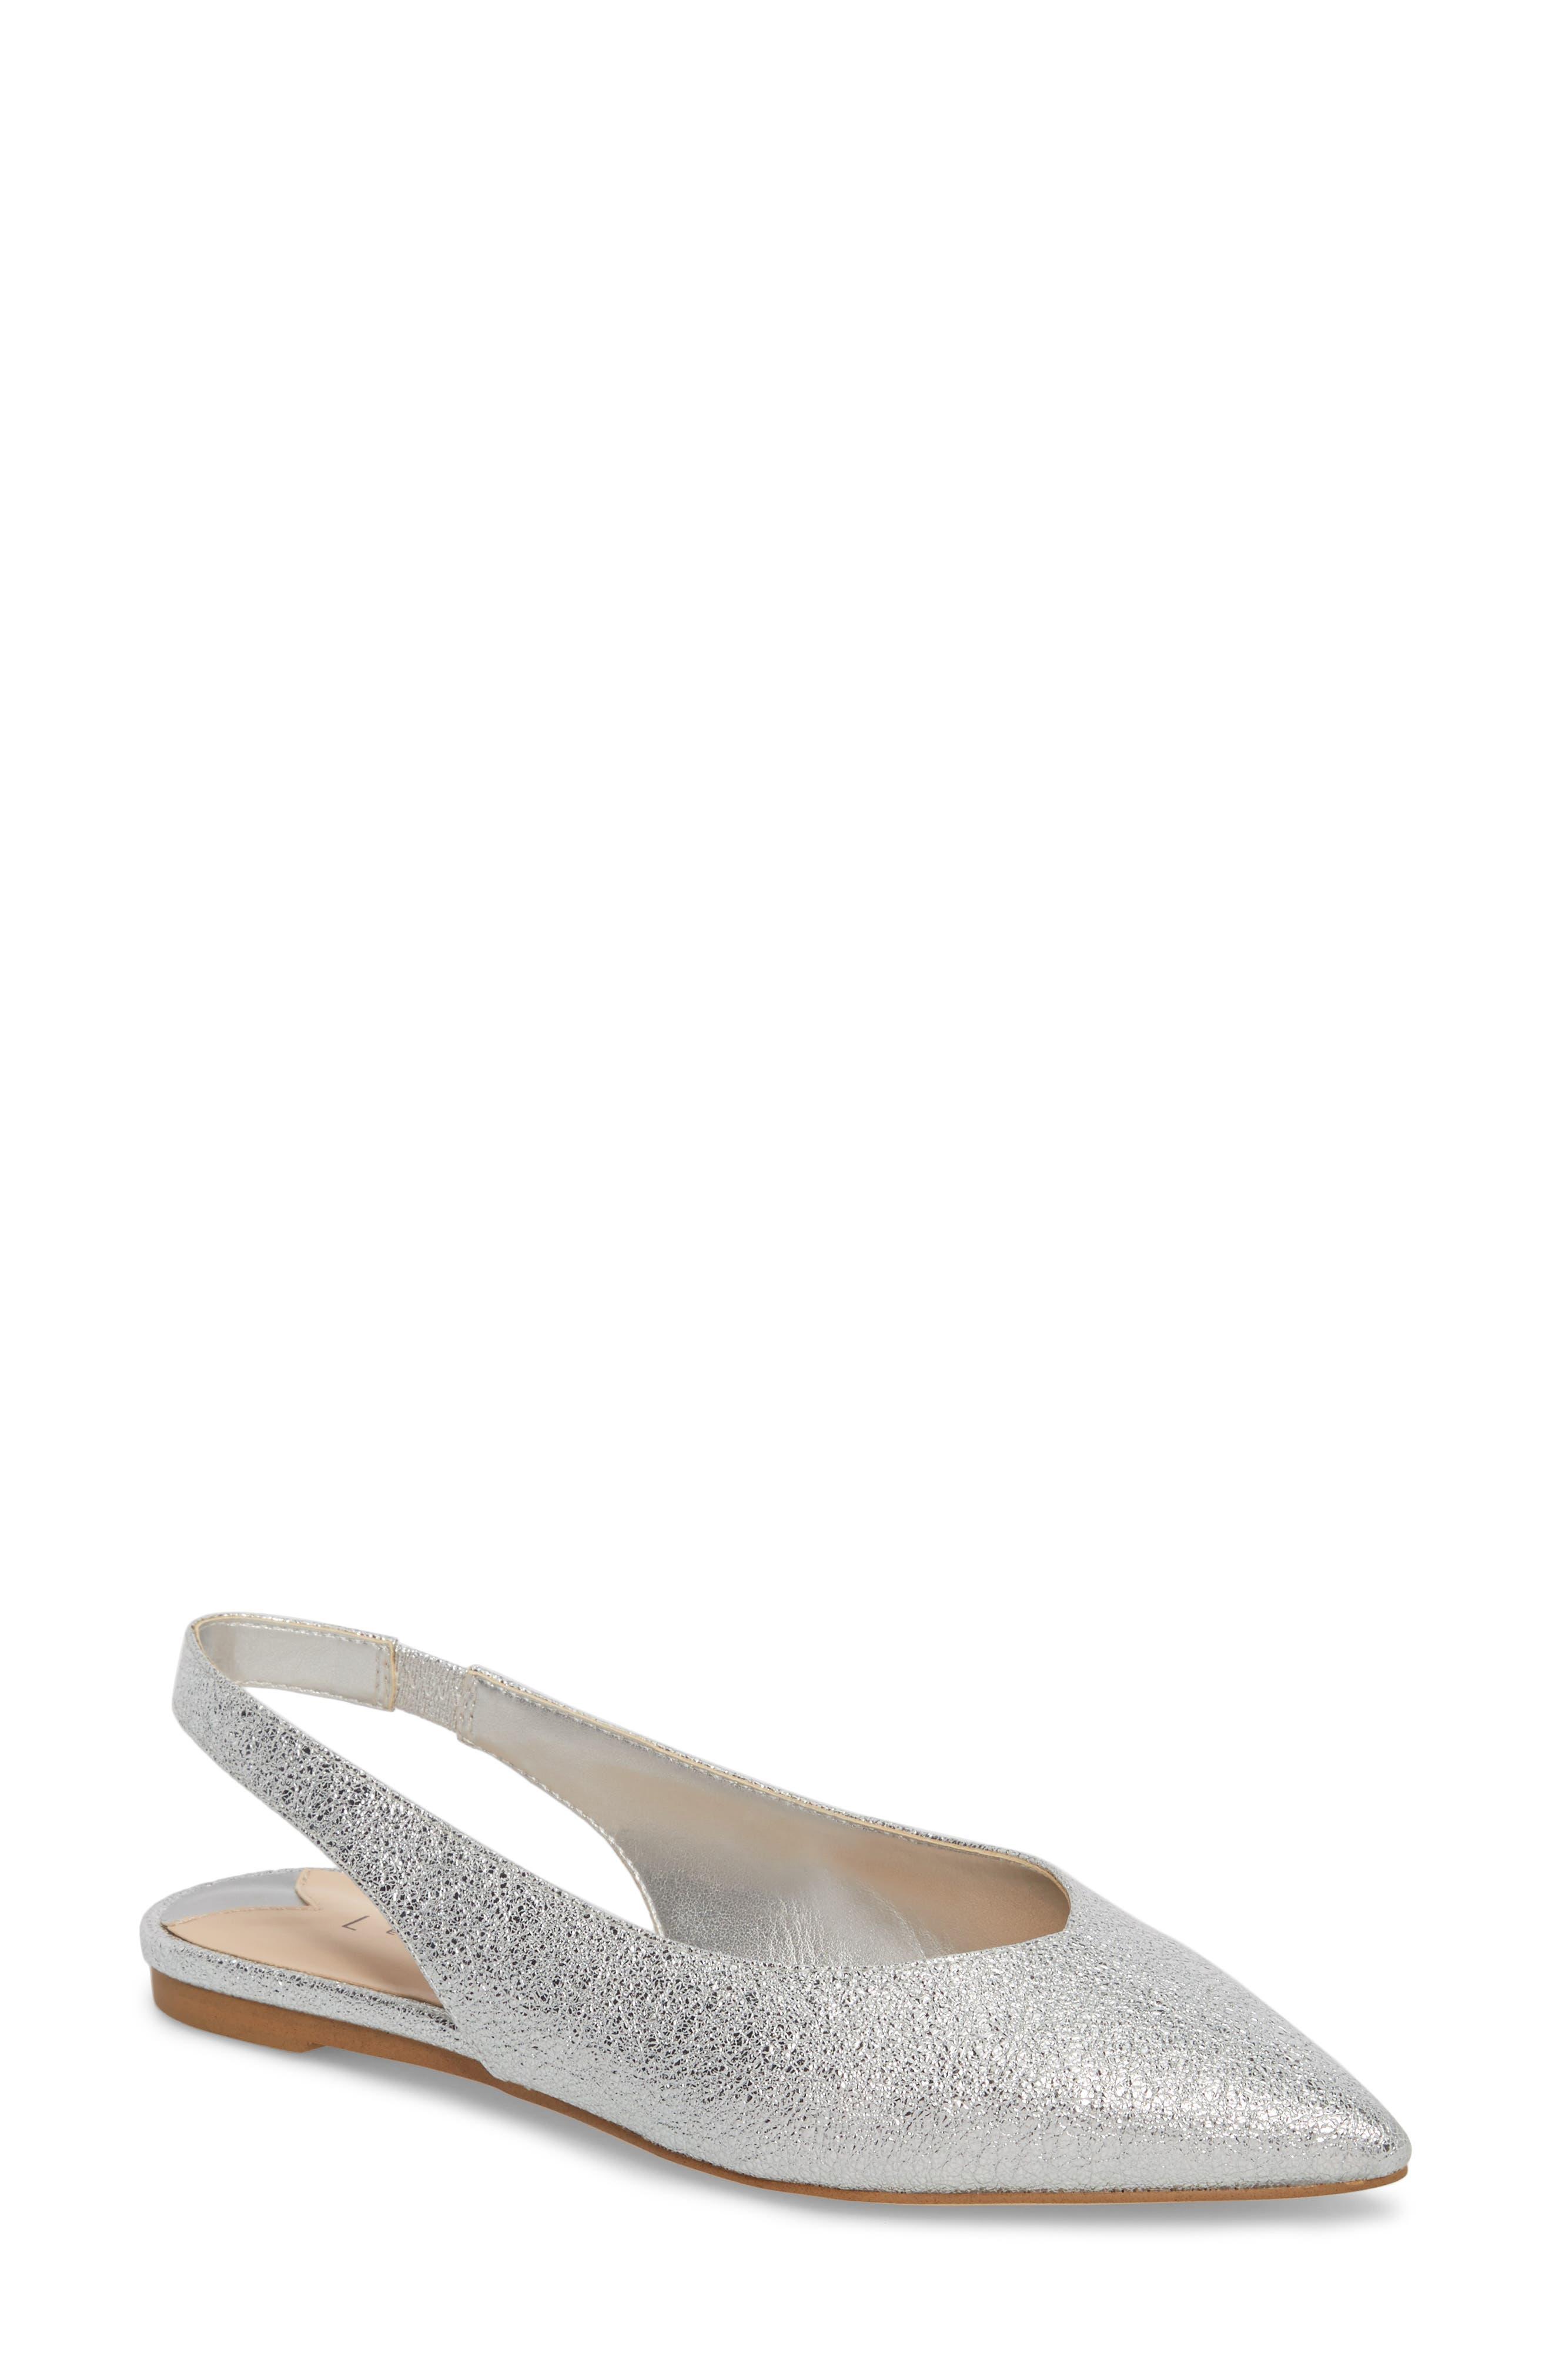 Masonn Slingback Flat,                         Main,                         color, Silver Crackle Faux Leather